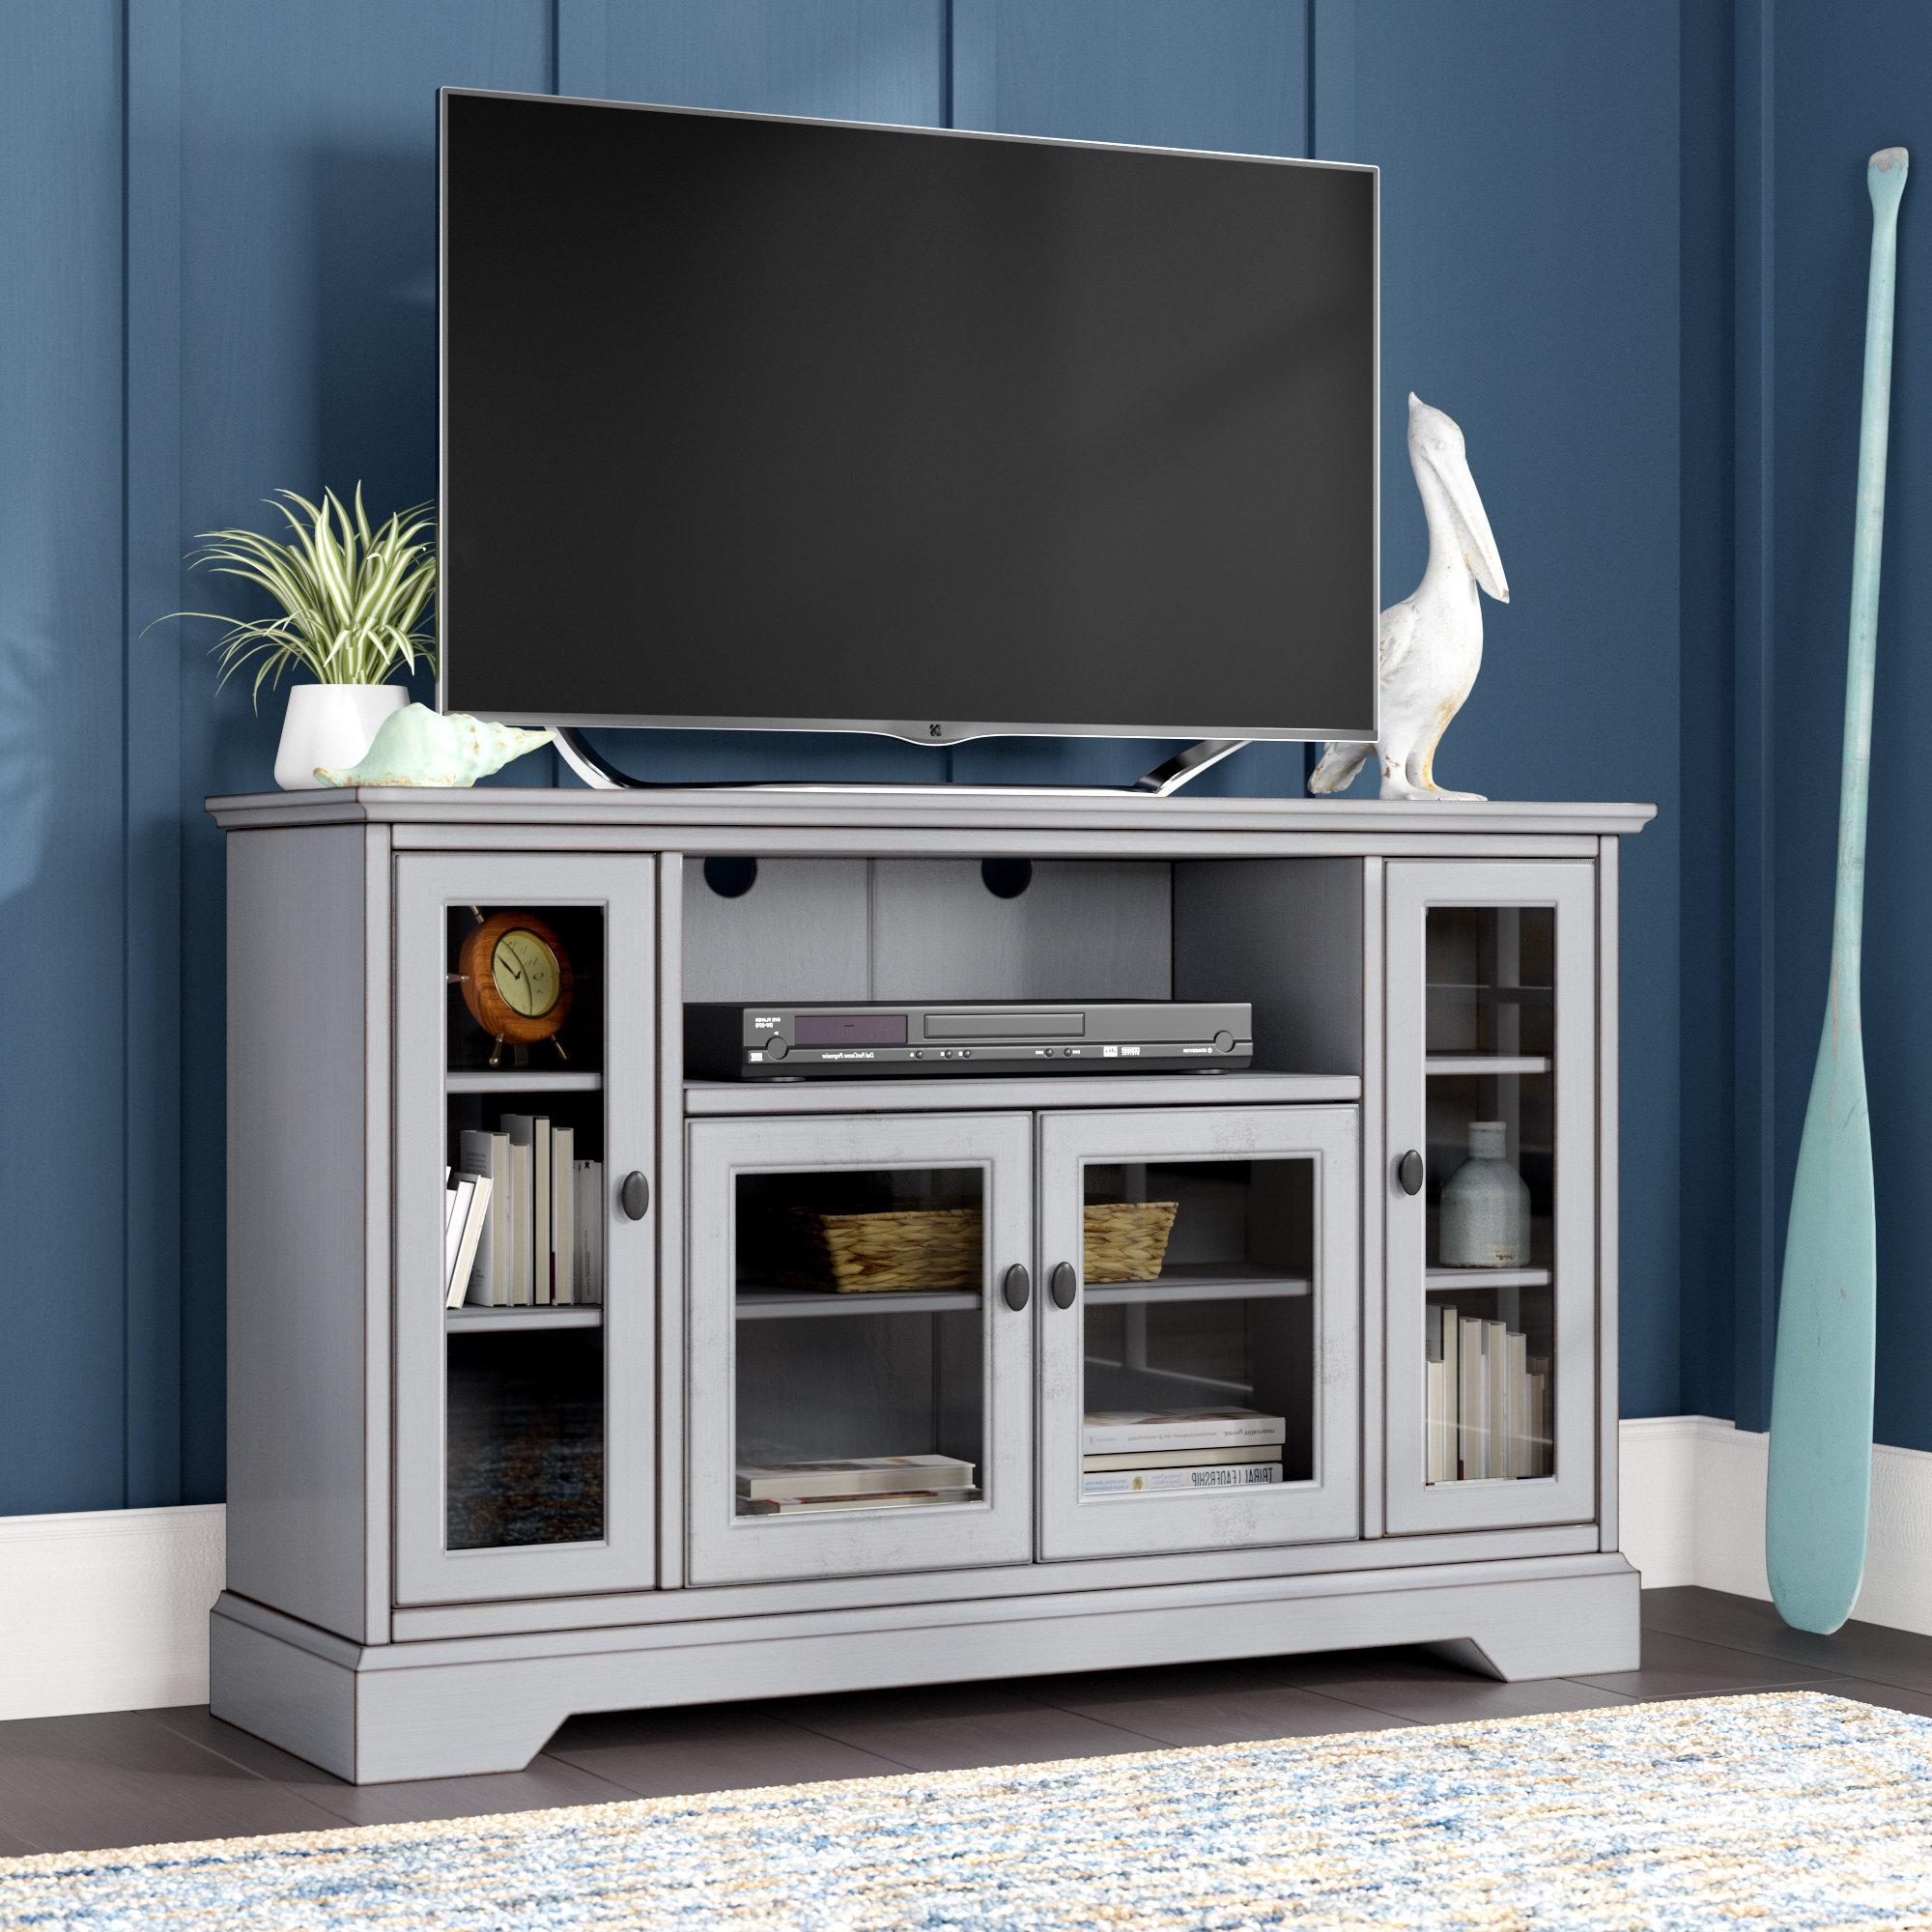 72 Inch Tv Stand | Wayfair Inside Kenzie 72 Inch Open Display Tv Stands (View 7 of 20)